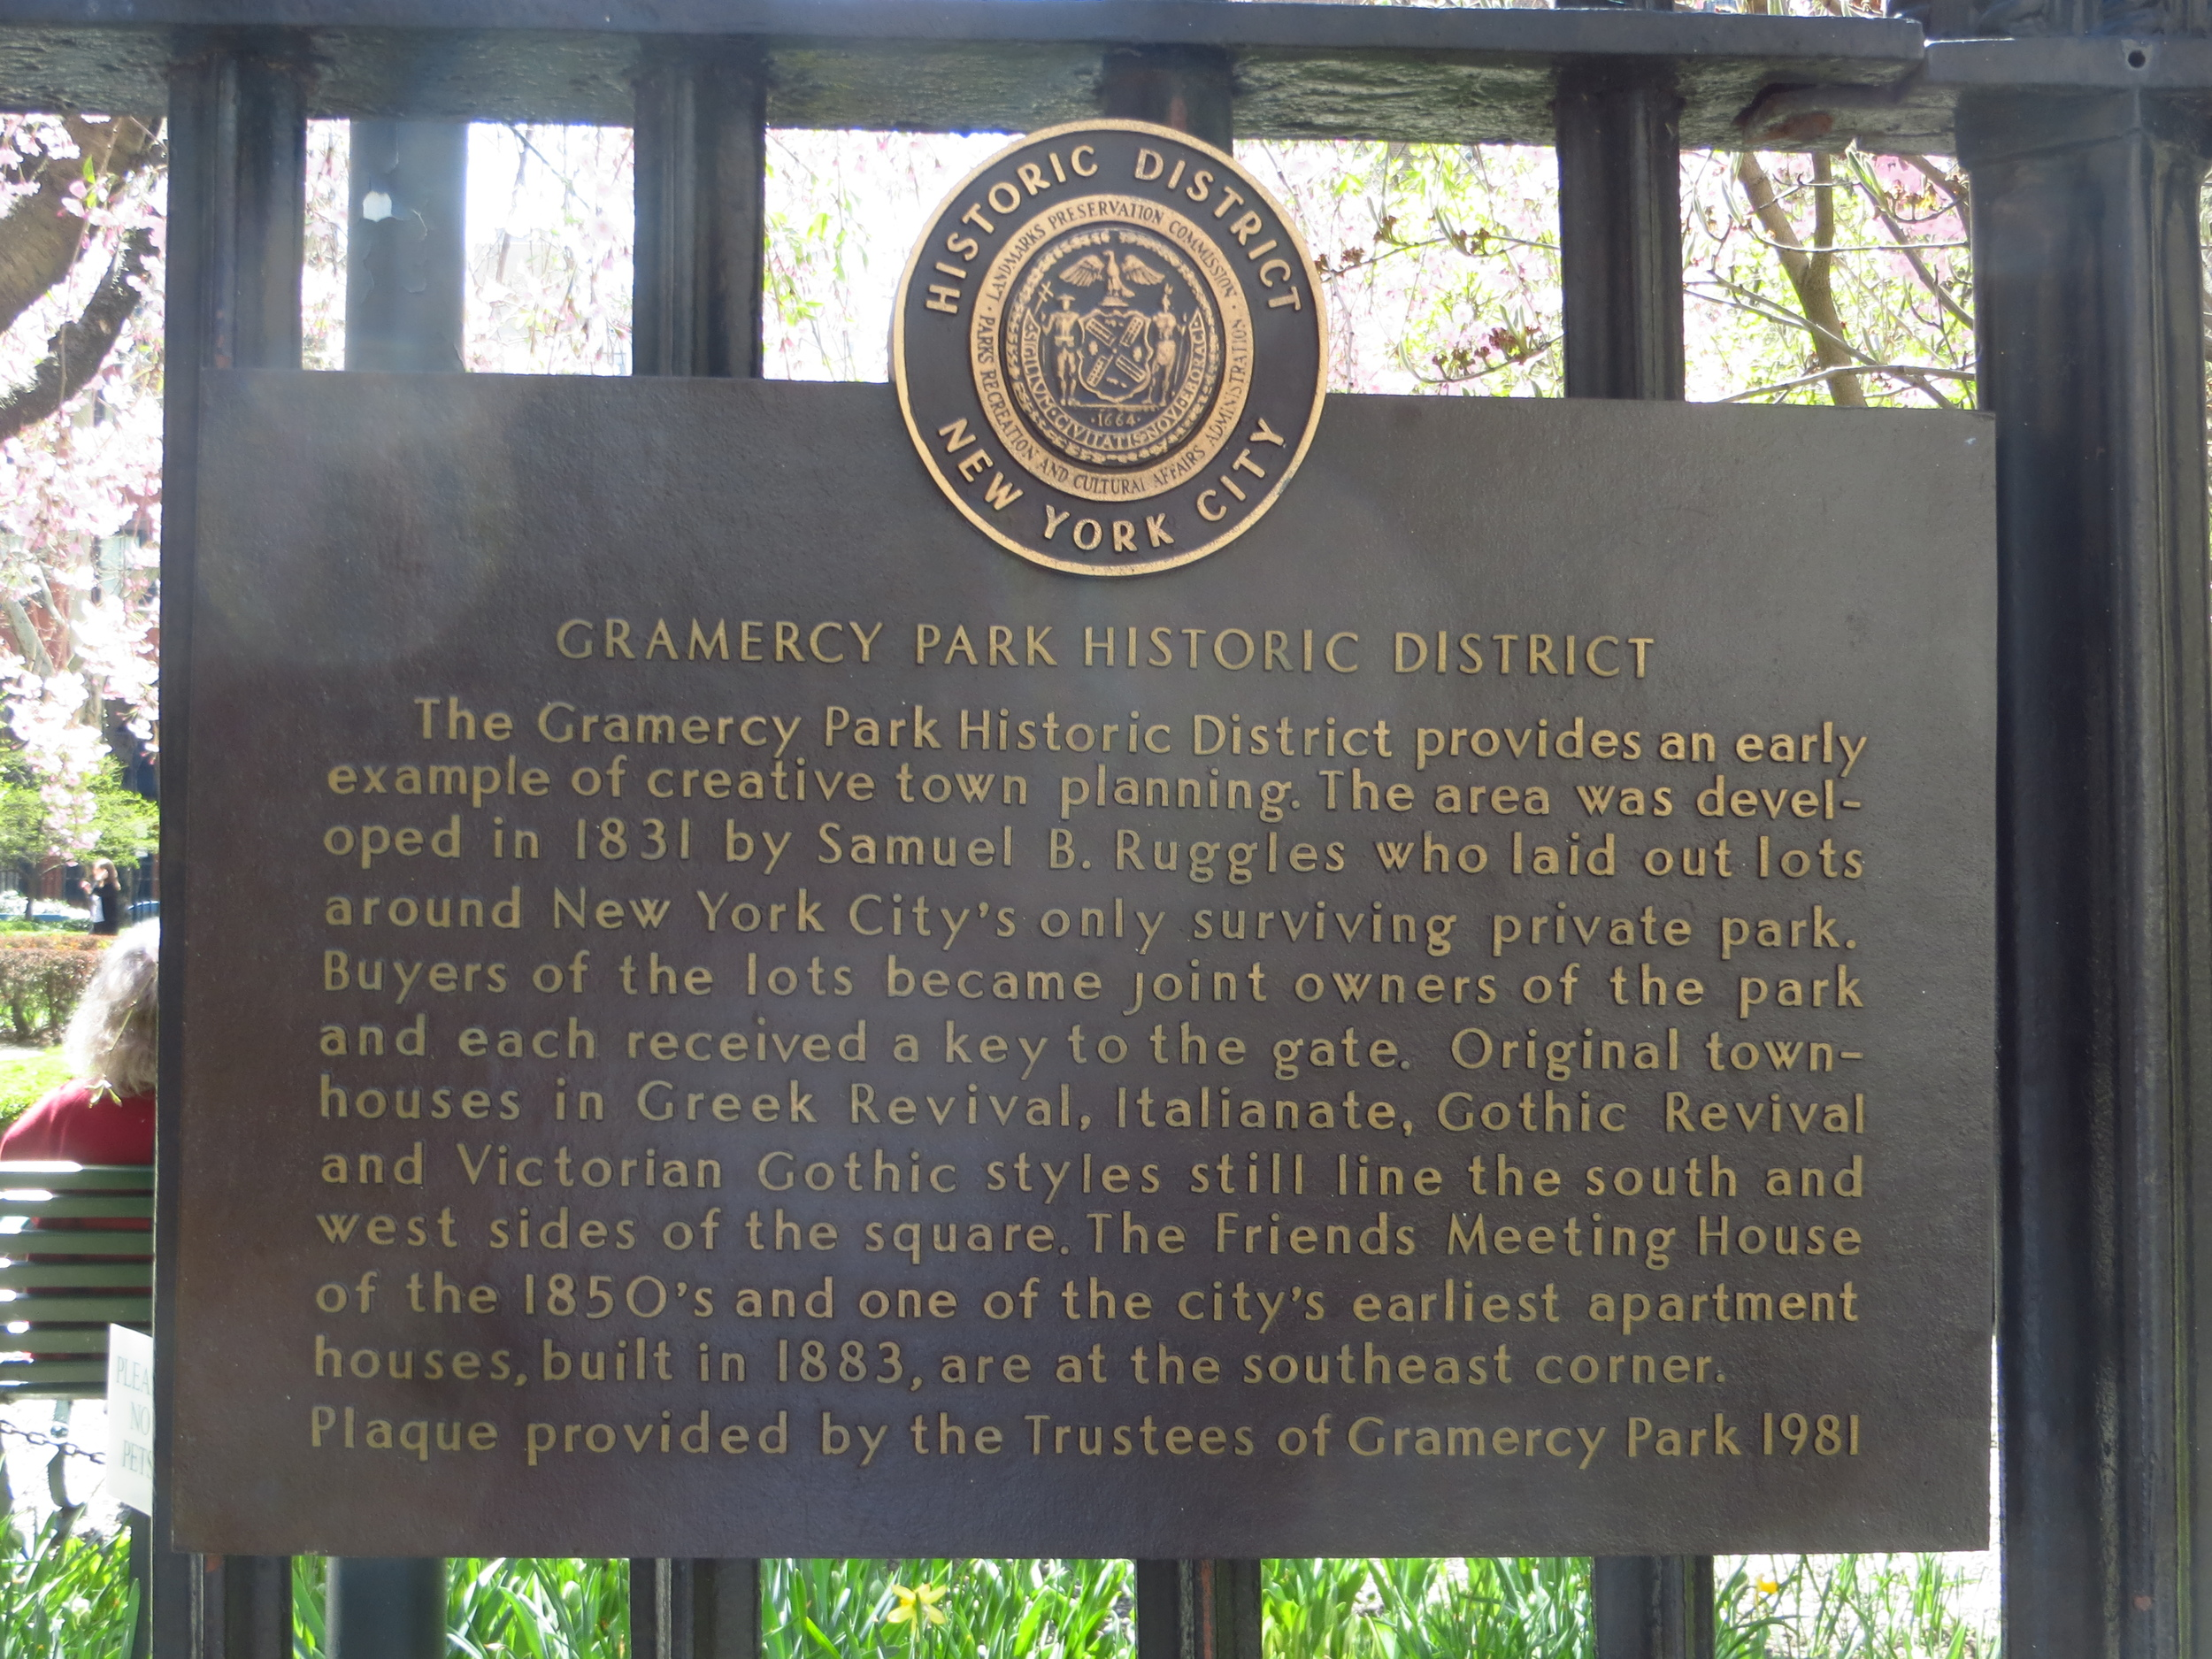 Gramercy Park (no plebs allowed)